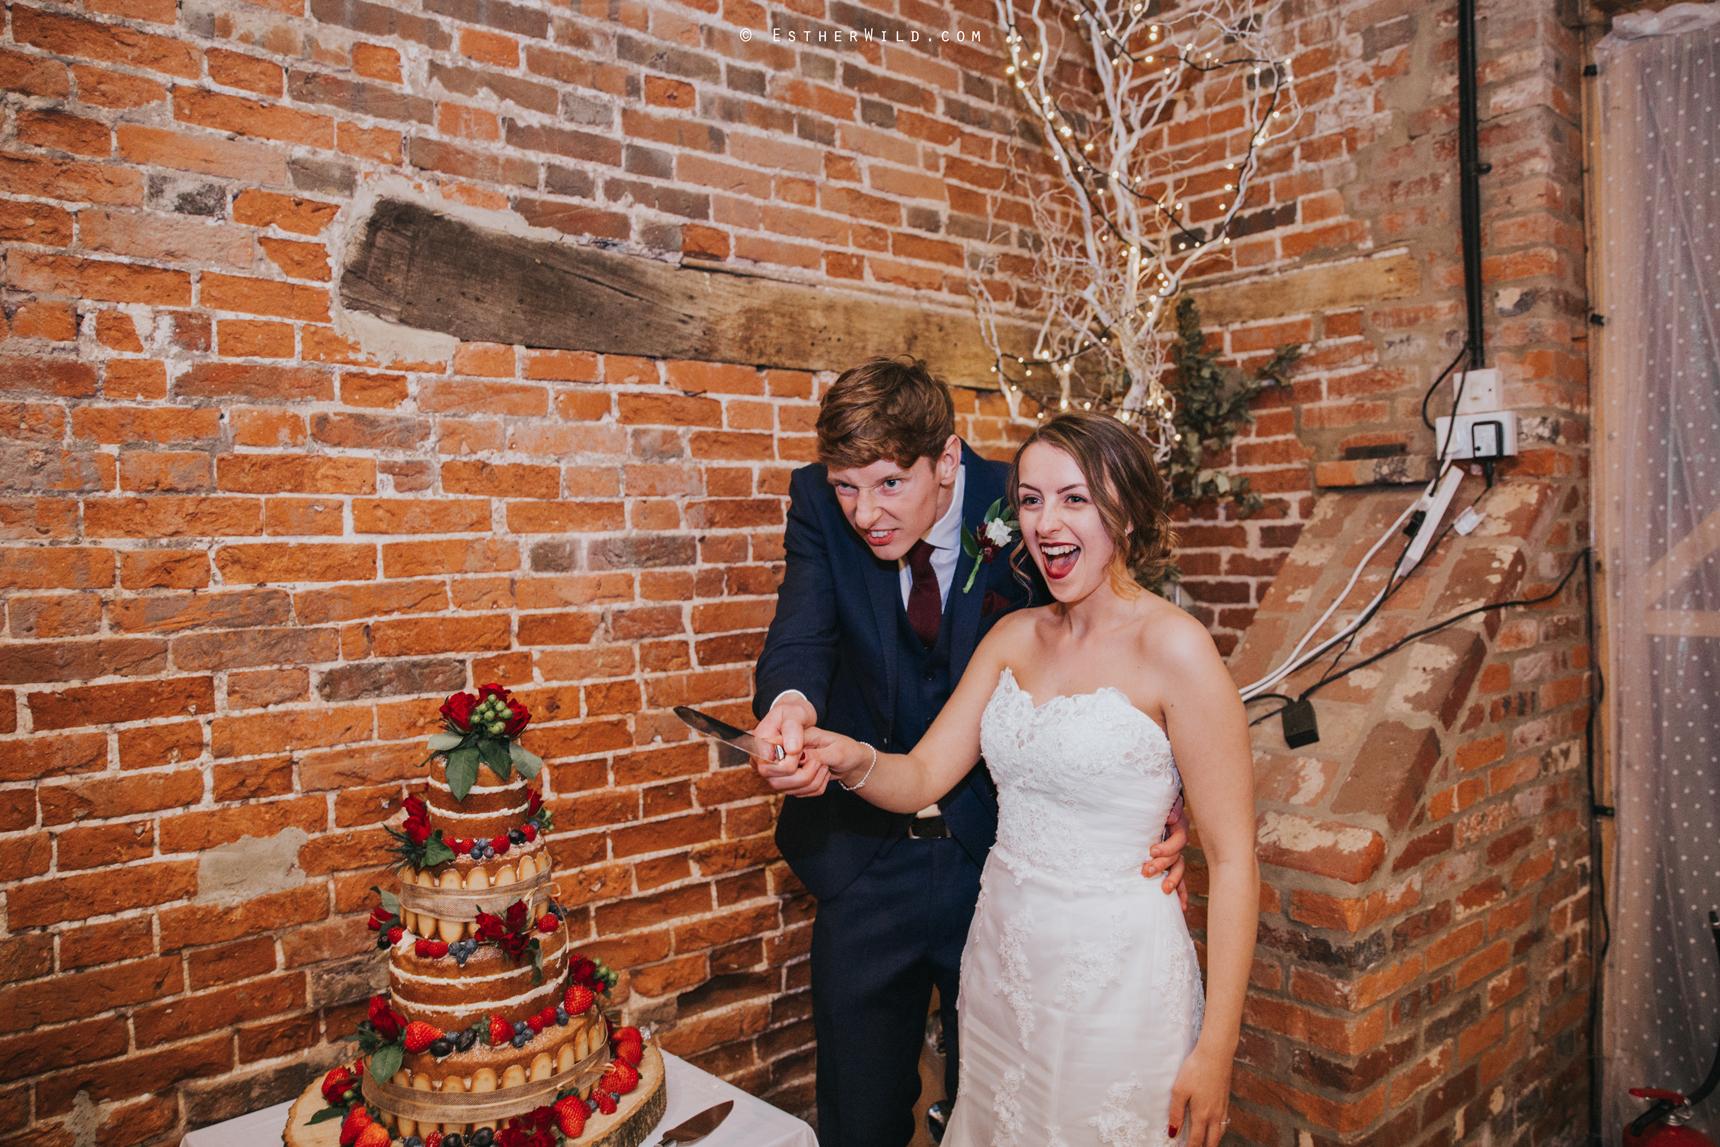 Glebe_Farm_Barn_Rustic_Norfolk_Wedding_Esther_Wild_Photographer_Copyright_IMG_2777.jpg